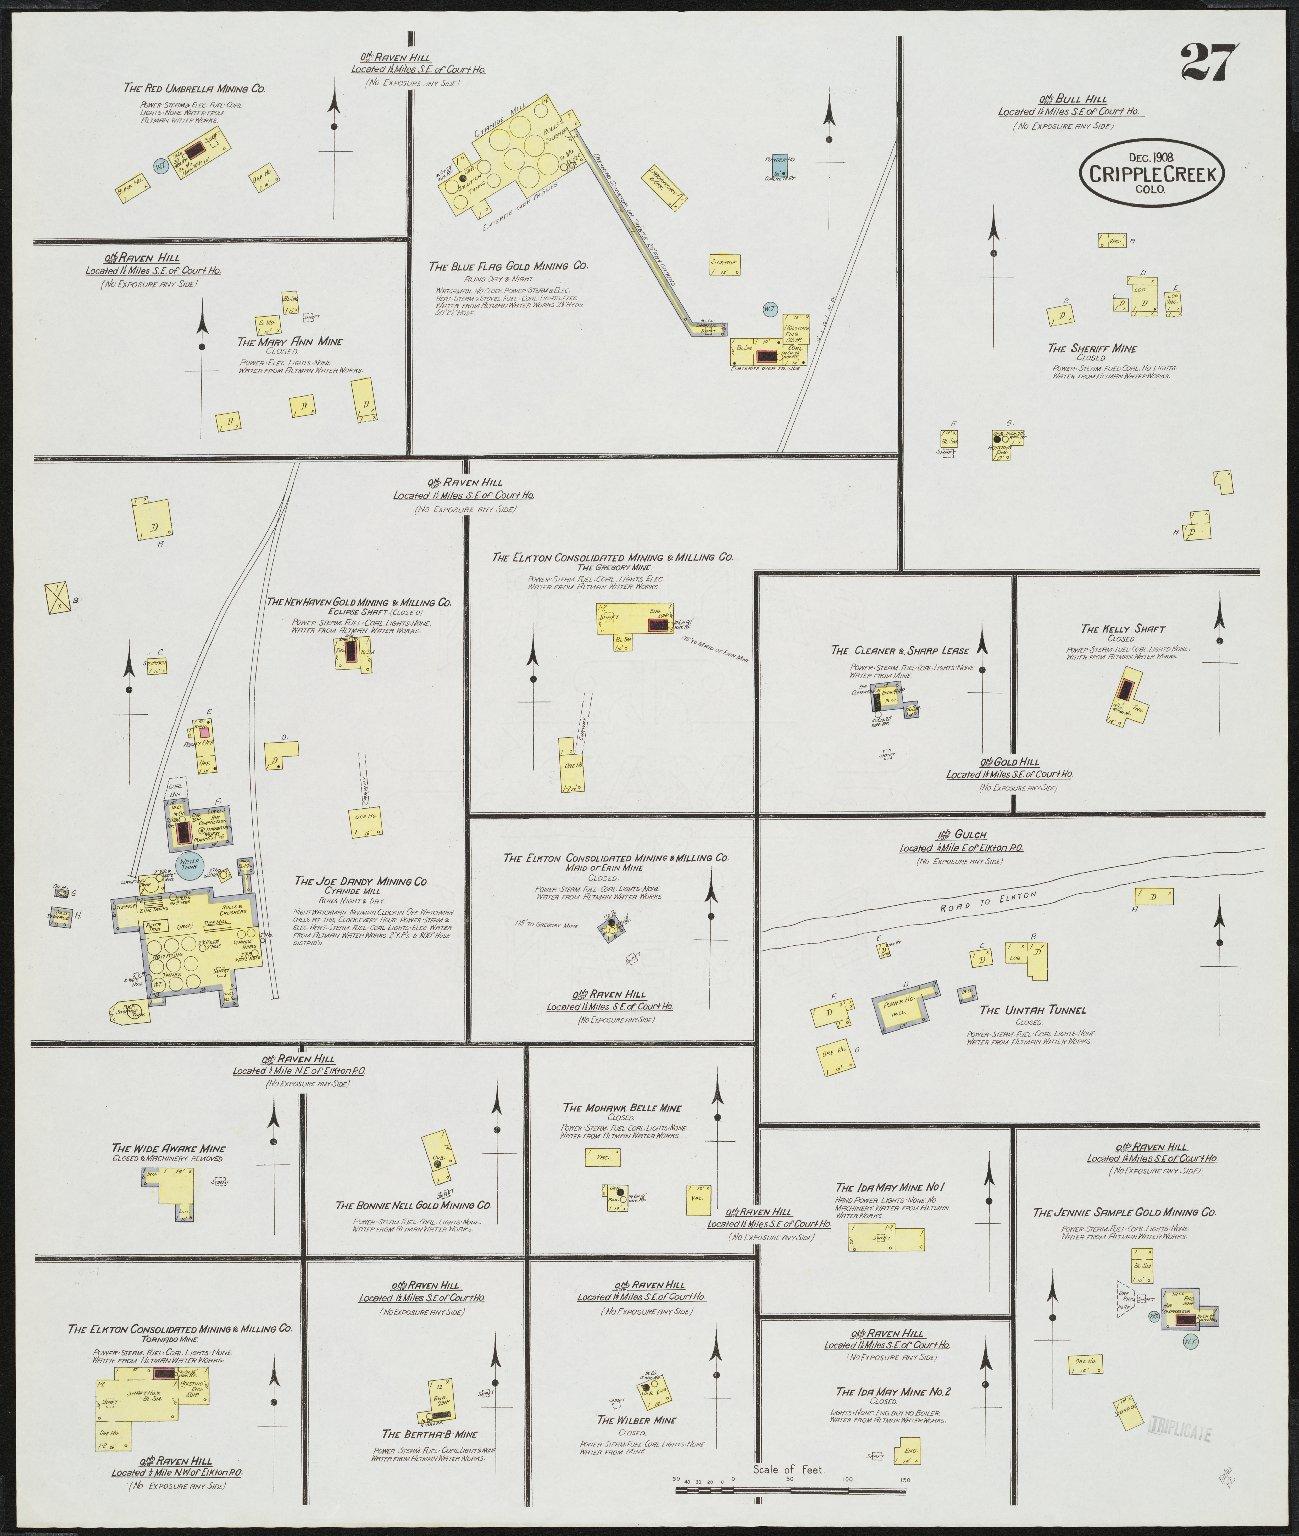 Insurance maps of Cripple Creek, Teller Co., Colorado